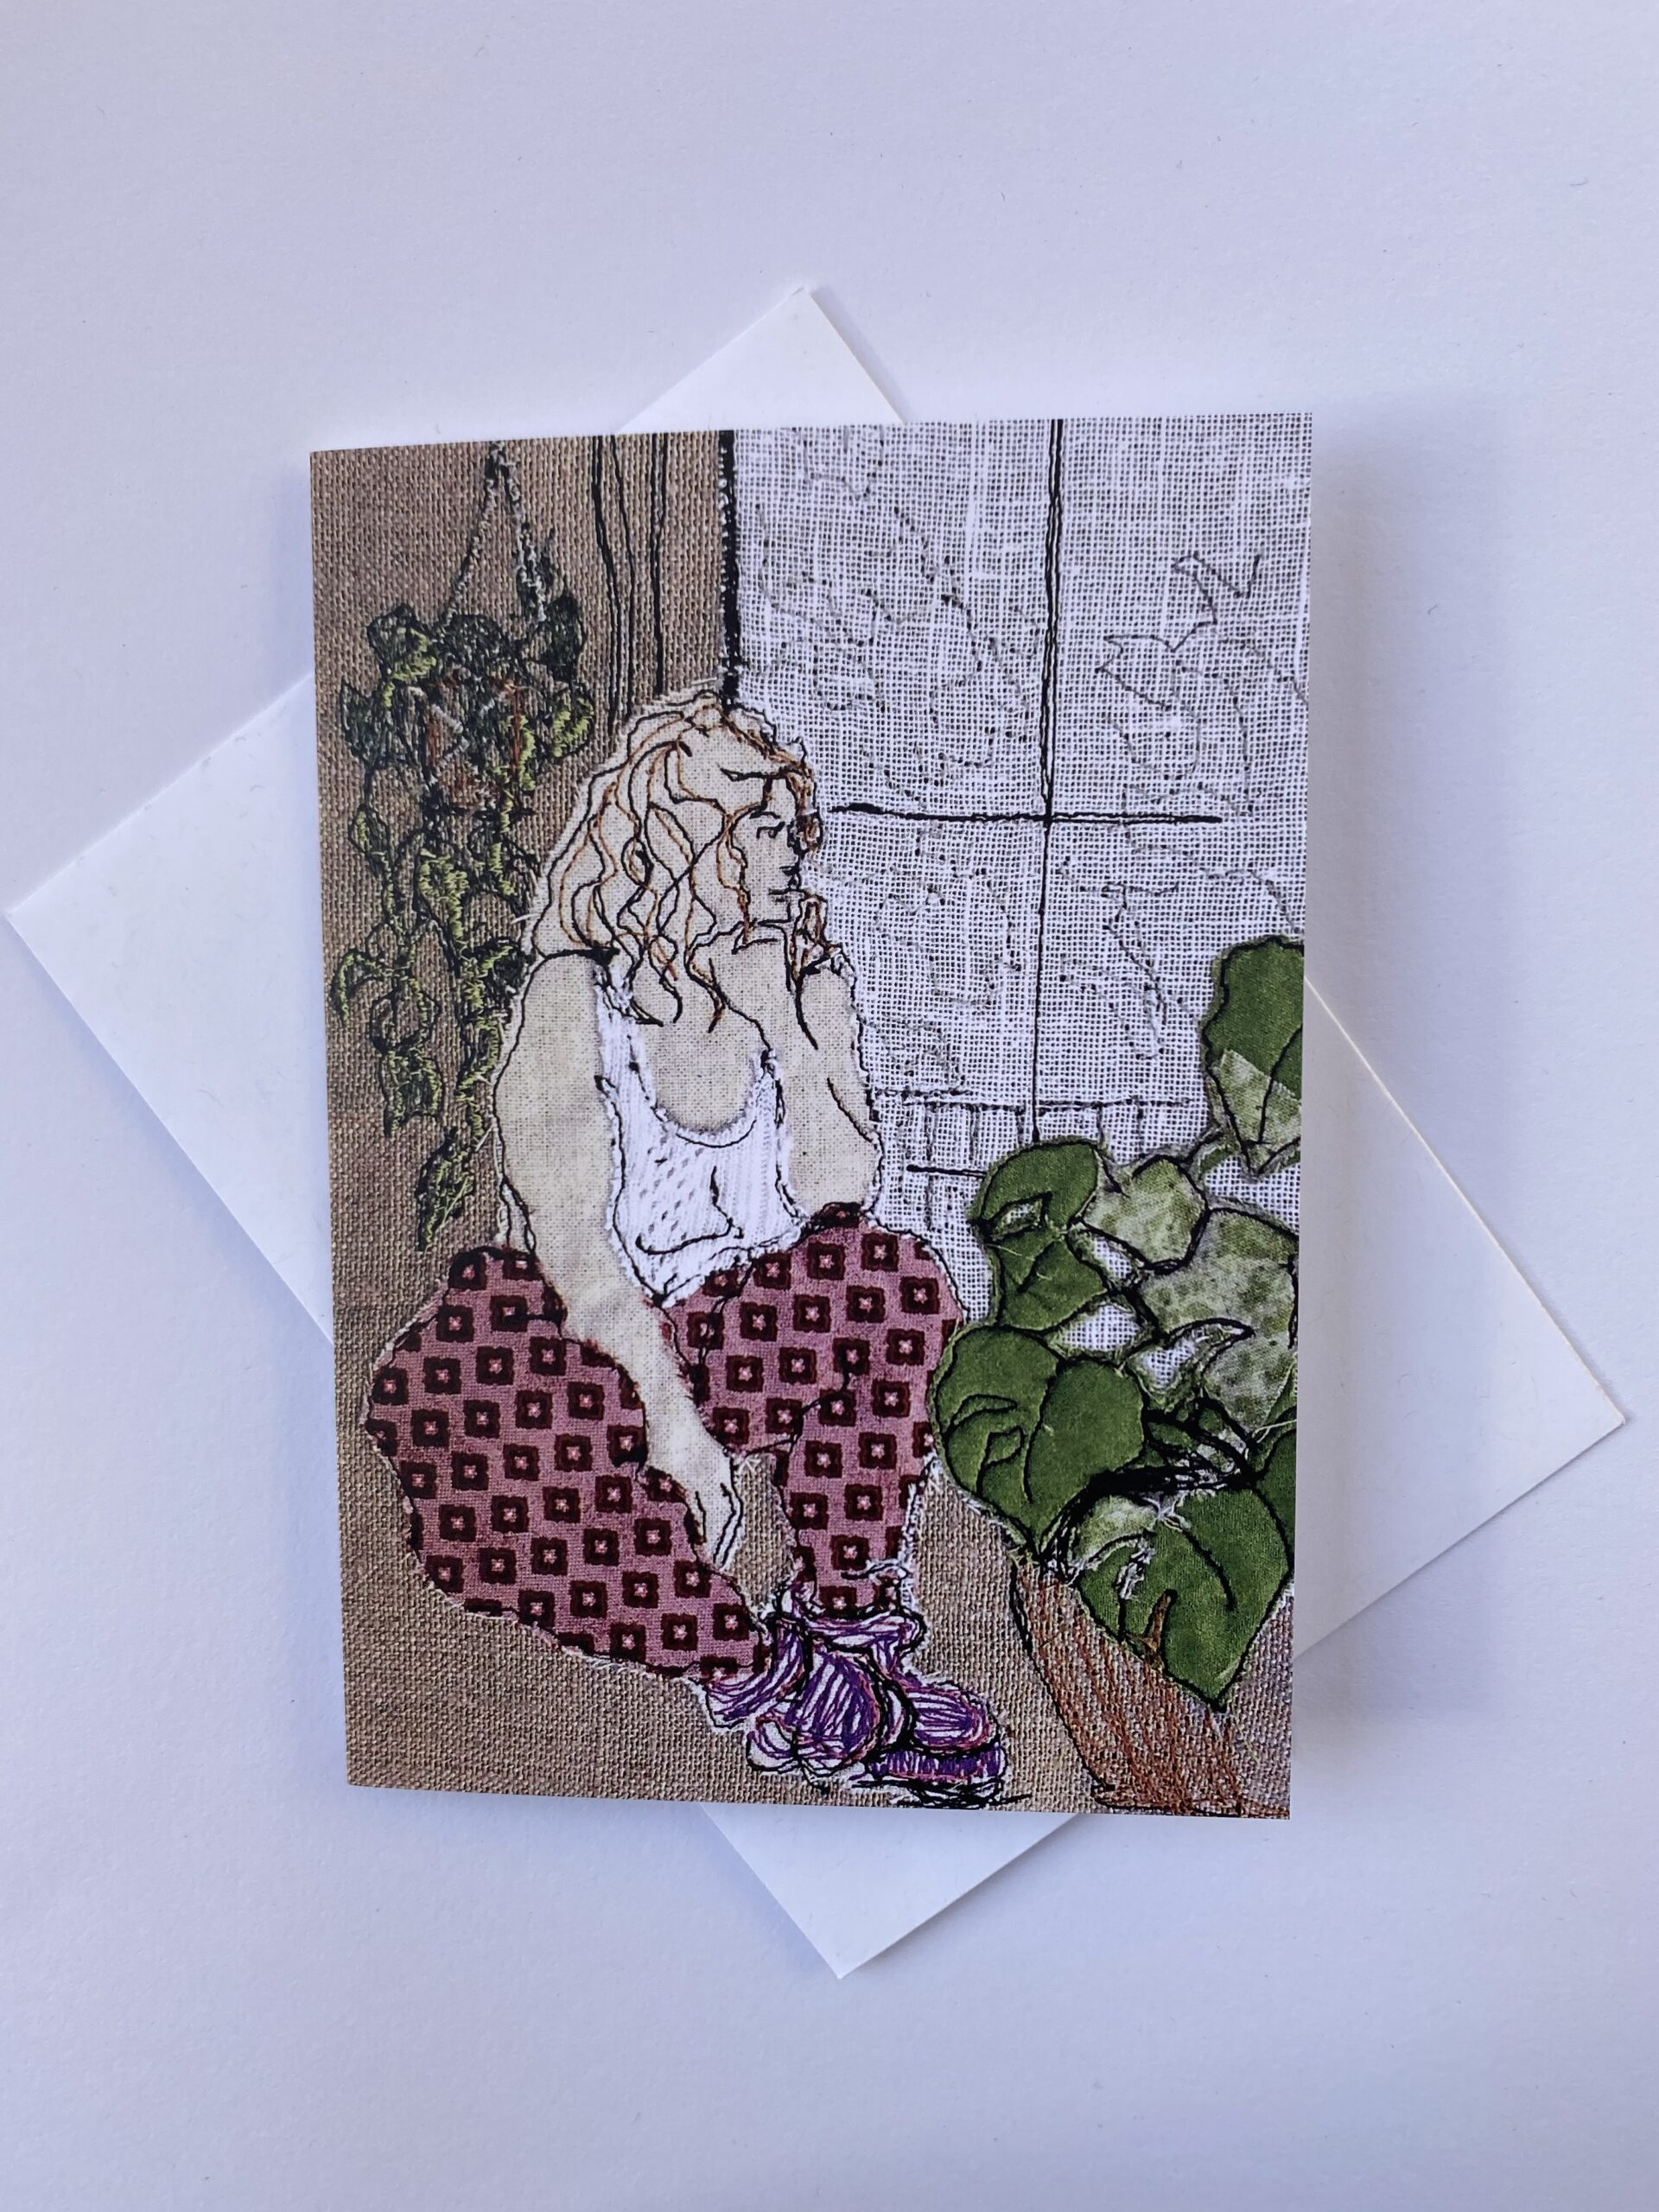 card-plantsitter-by-juliet-d-collins--julietdcollins